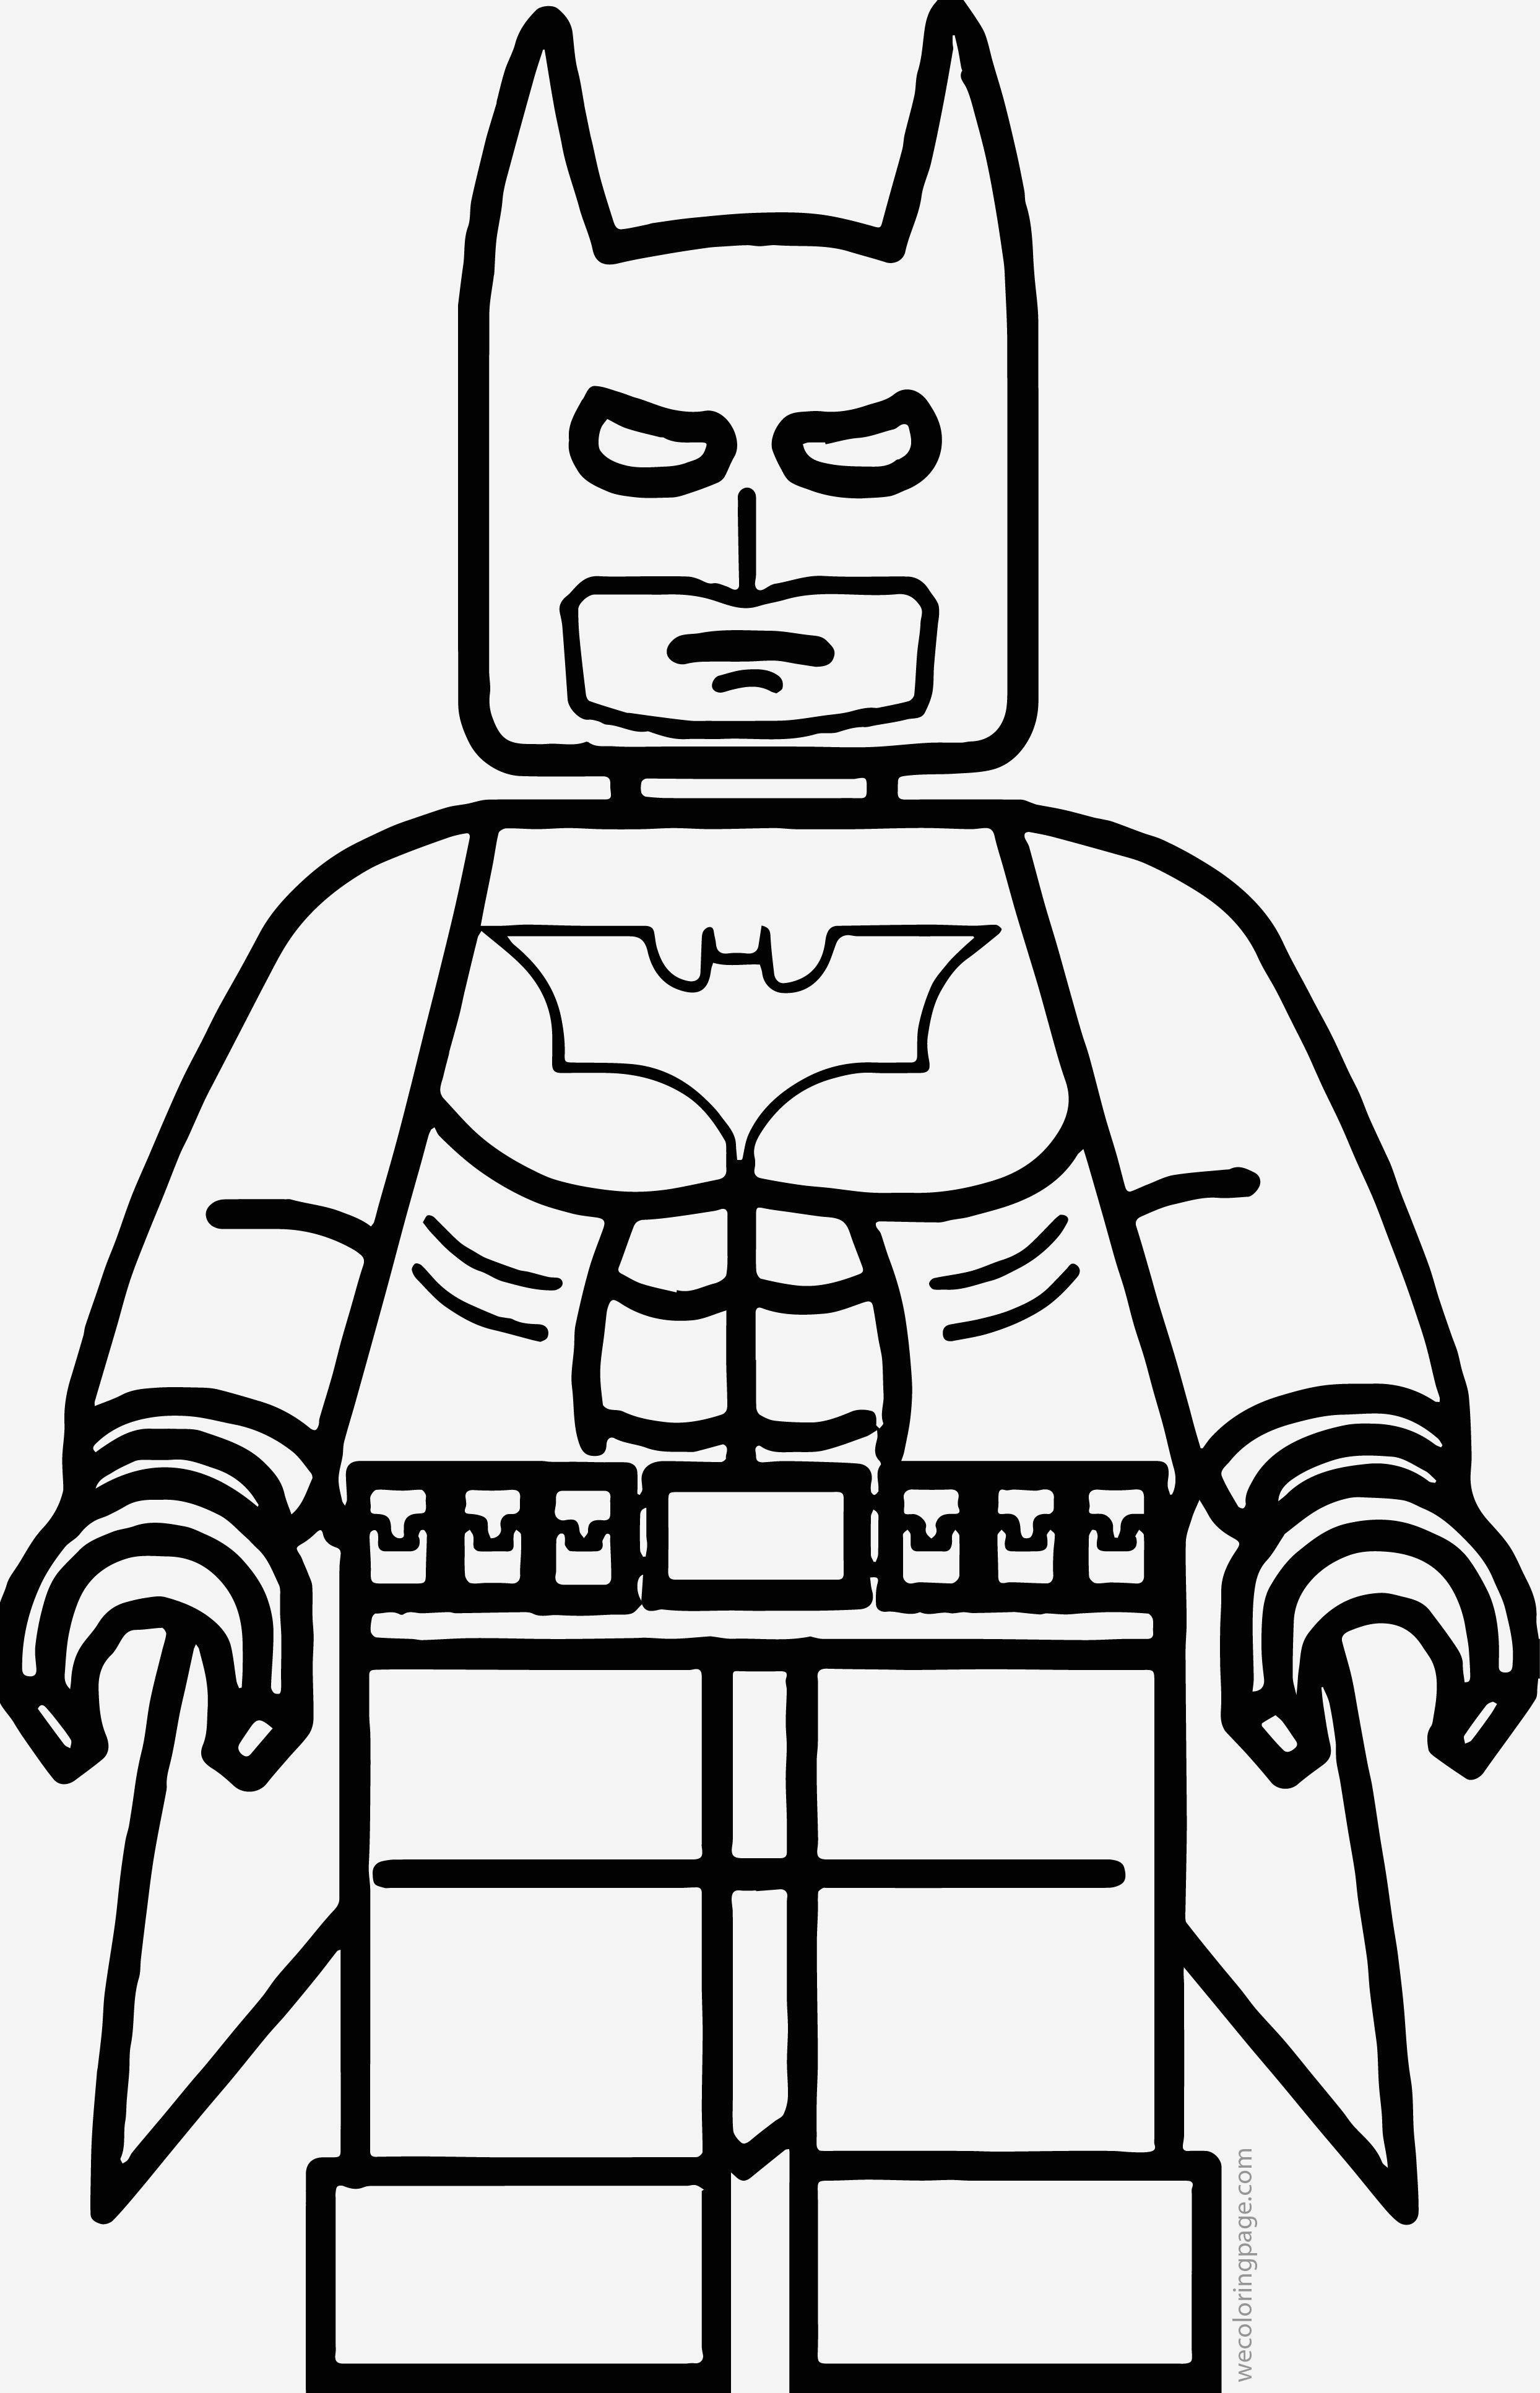 Ausmalbilder Lego Batman Inspirierend Spannende Coloring Bilder Ausmalbilder Batman Sammlung